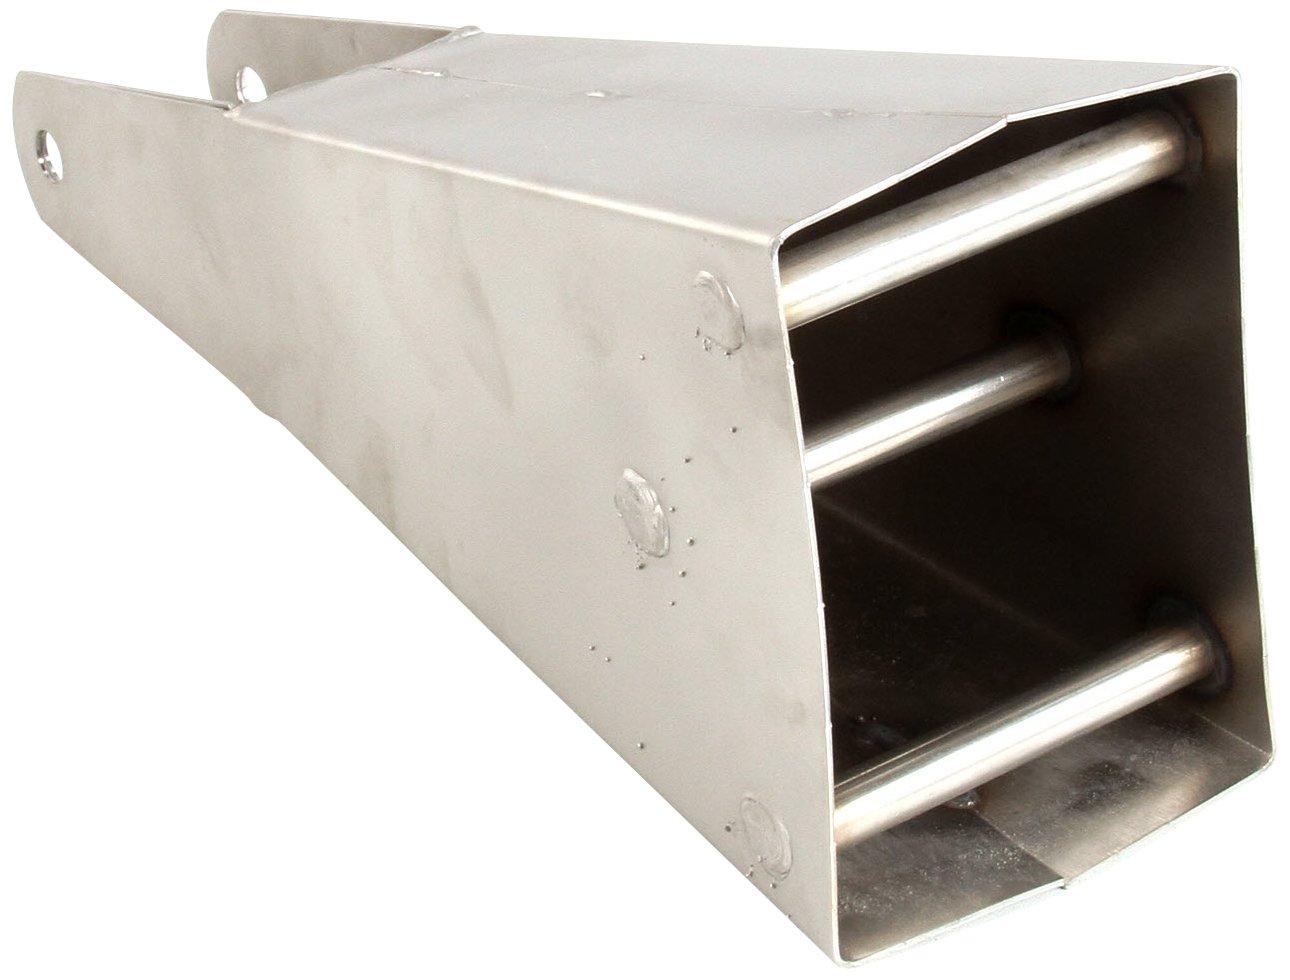 Stero Dishwasher favorite A10-1942 Release Manufacturer direct delivery Upper Half Housing